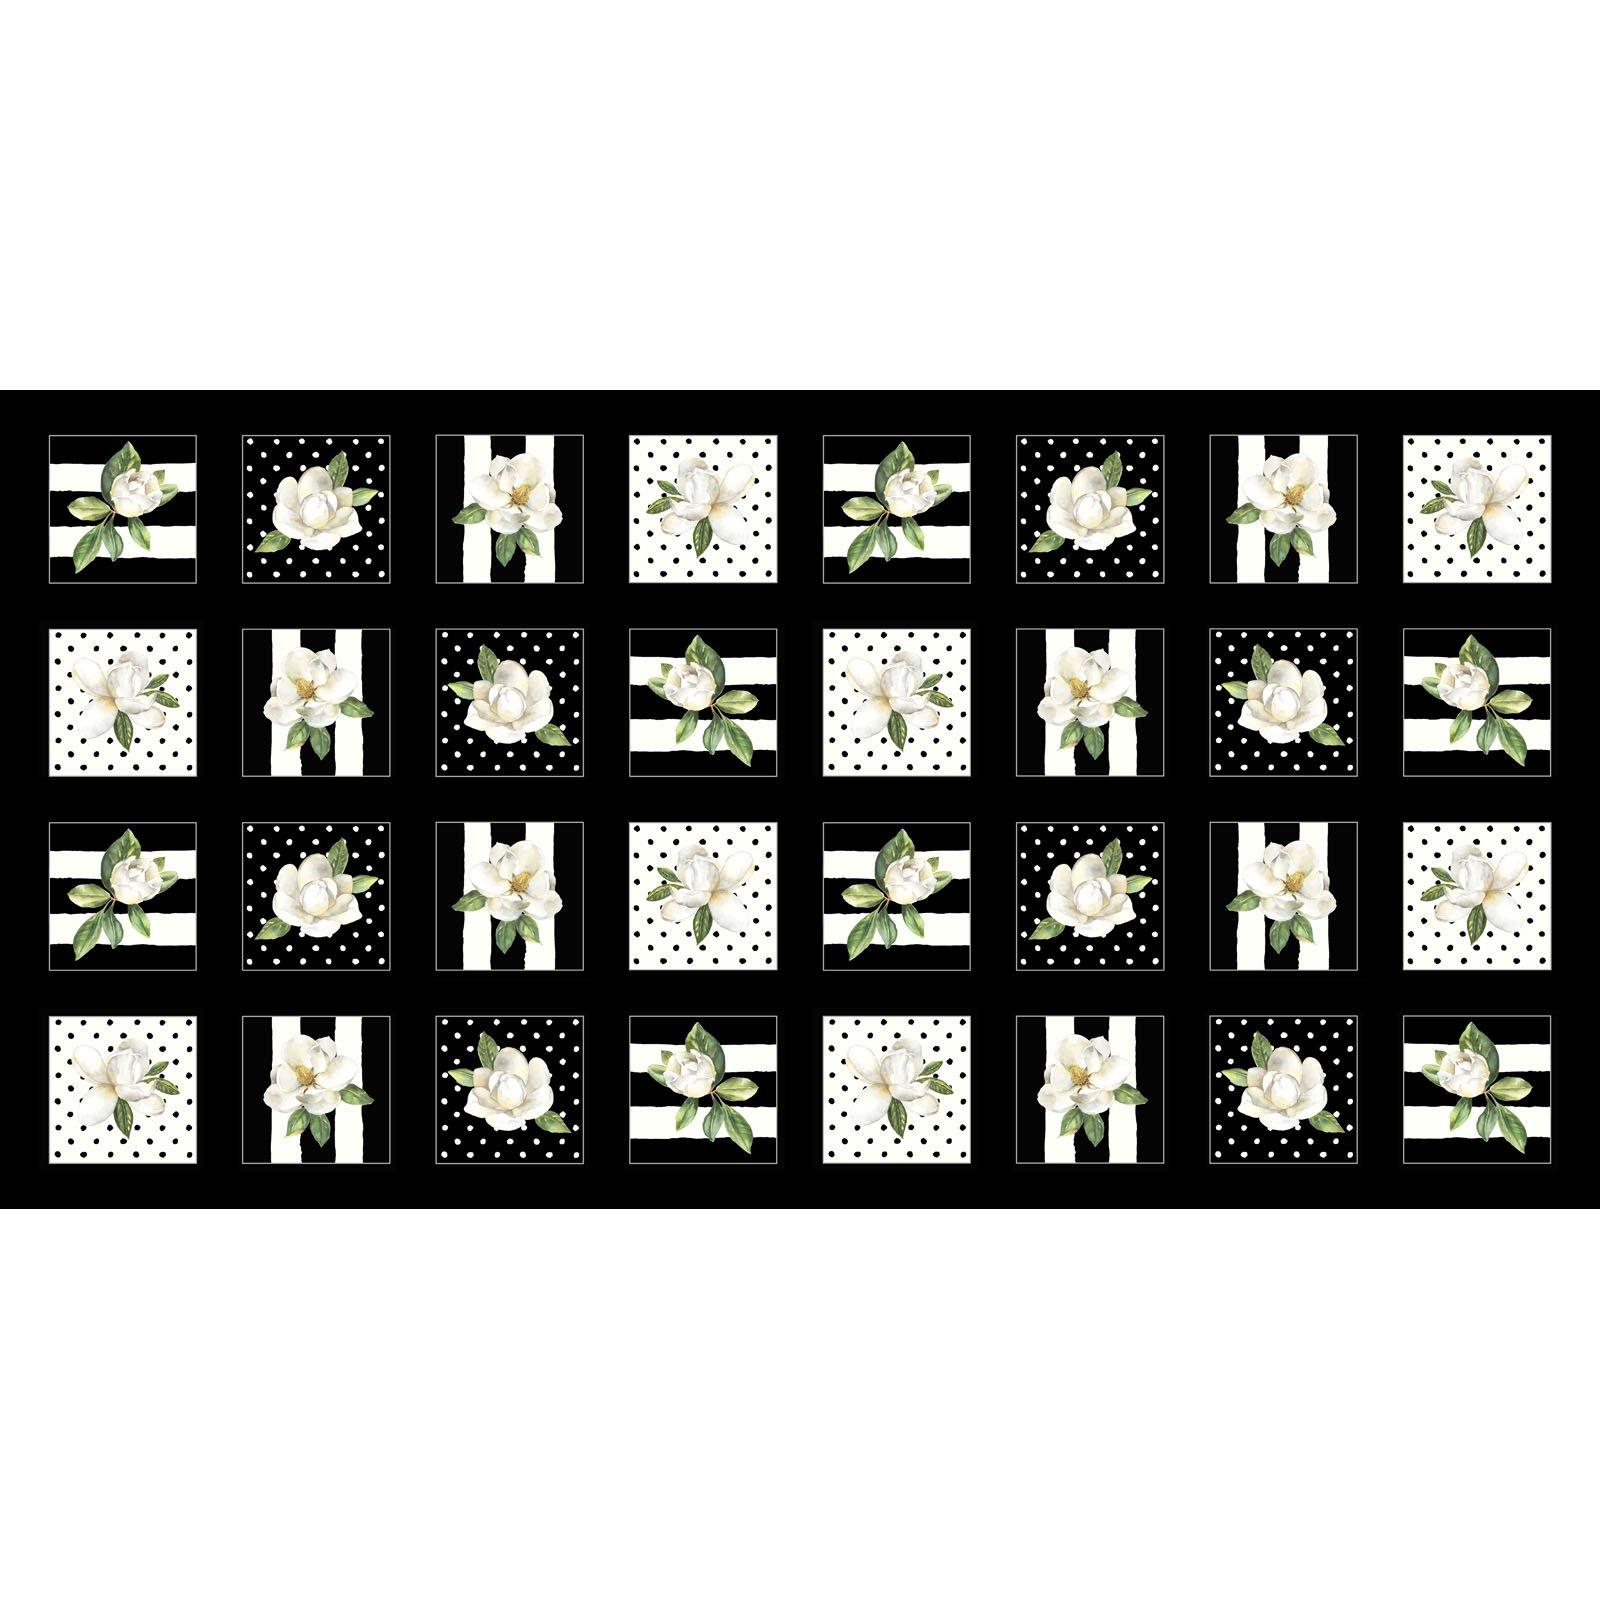 MAGN-4278 K - MAGNOLIAS BY SANDY CLOUGH 4 MAGNOLIA SQ BLACK